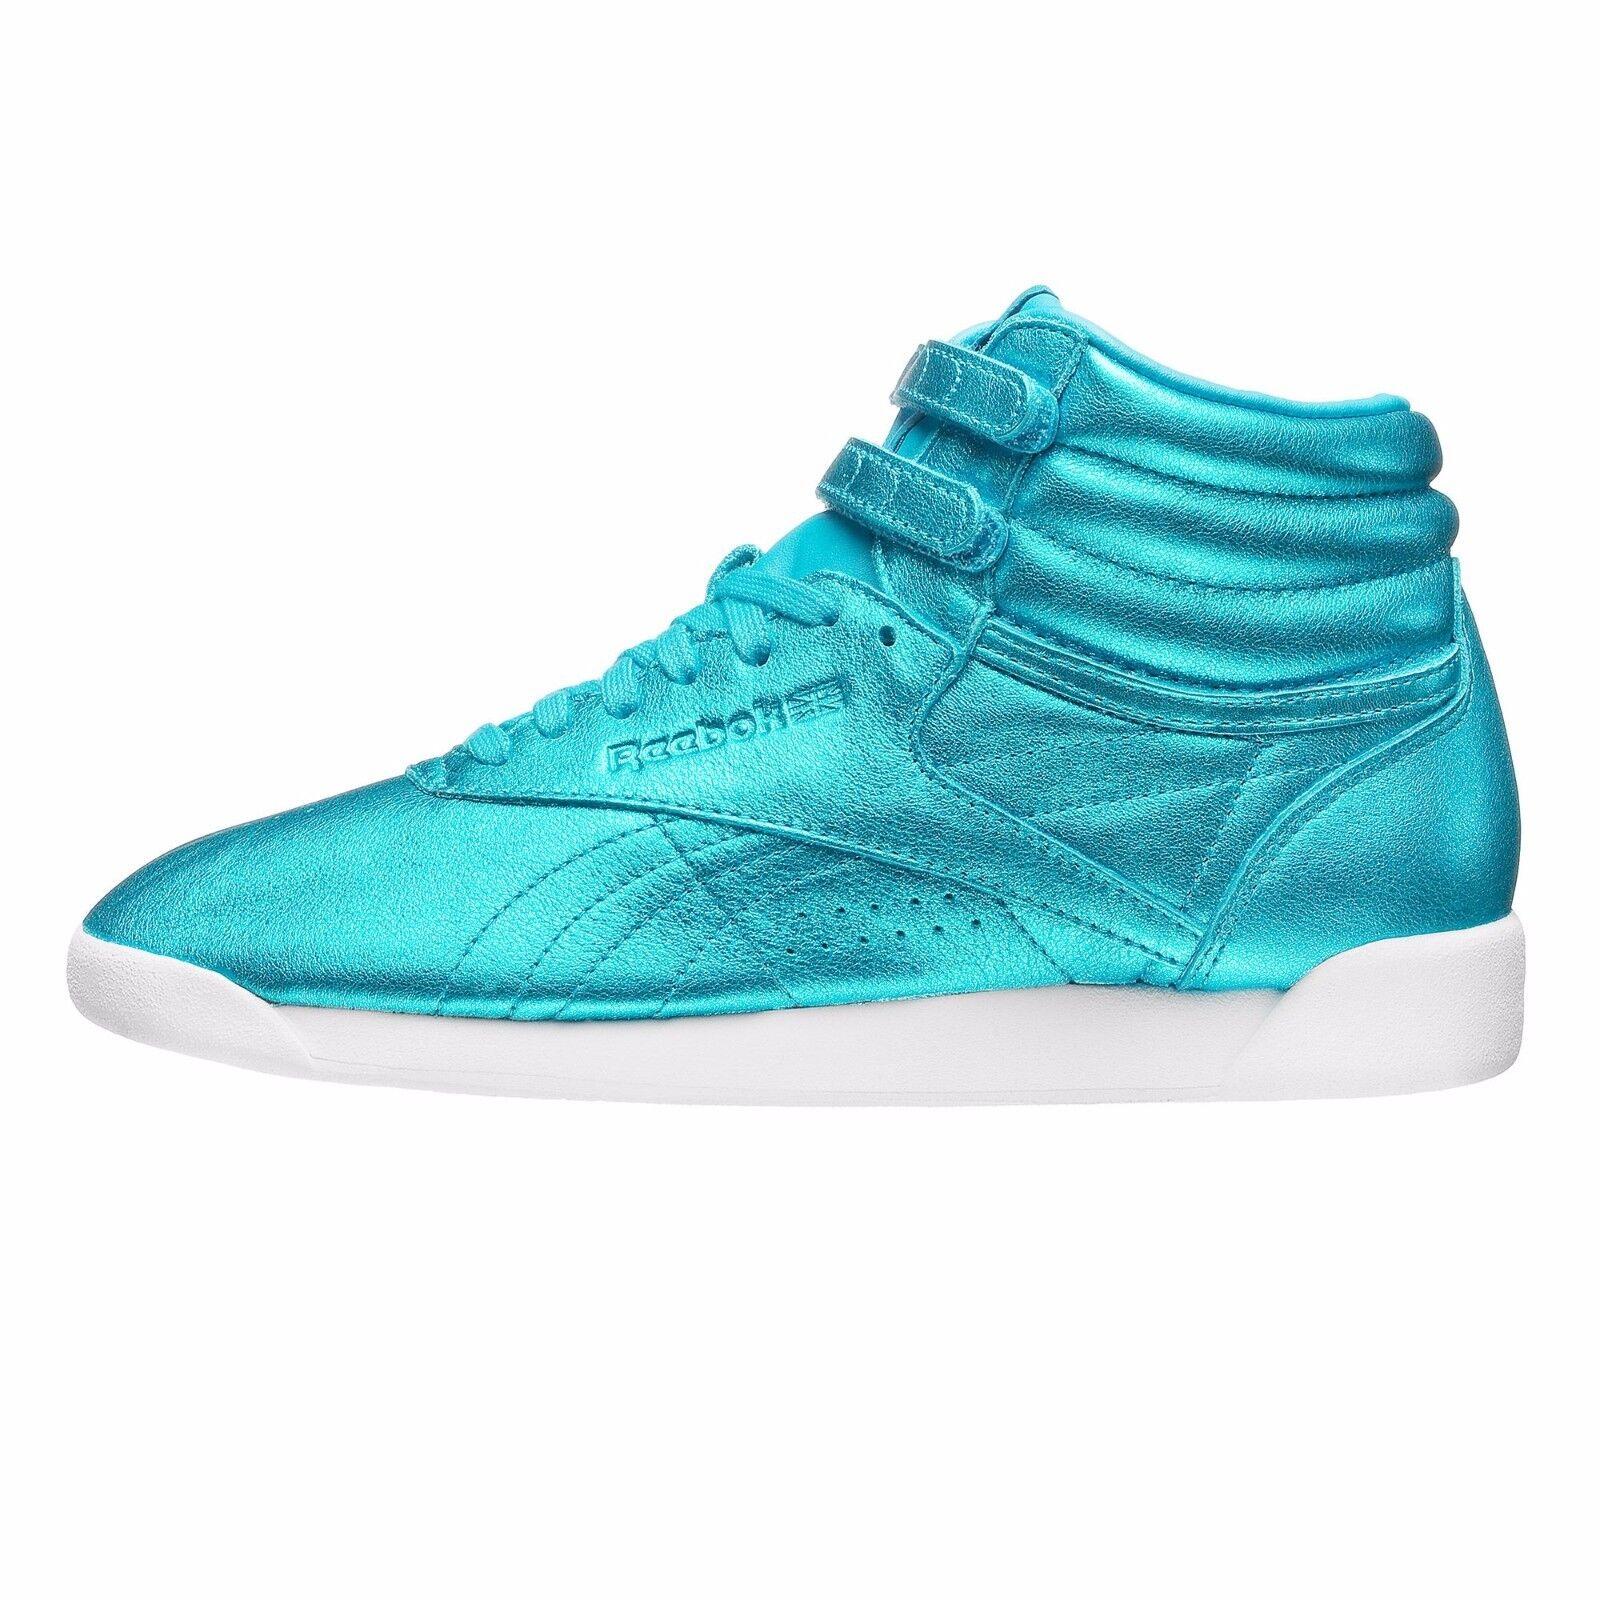 Reebok Women's FREESTYLE HI METALLIC Shoes Feather Blue CN0959 b